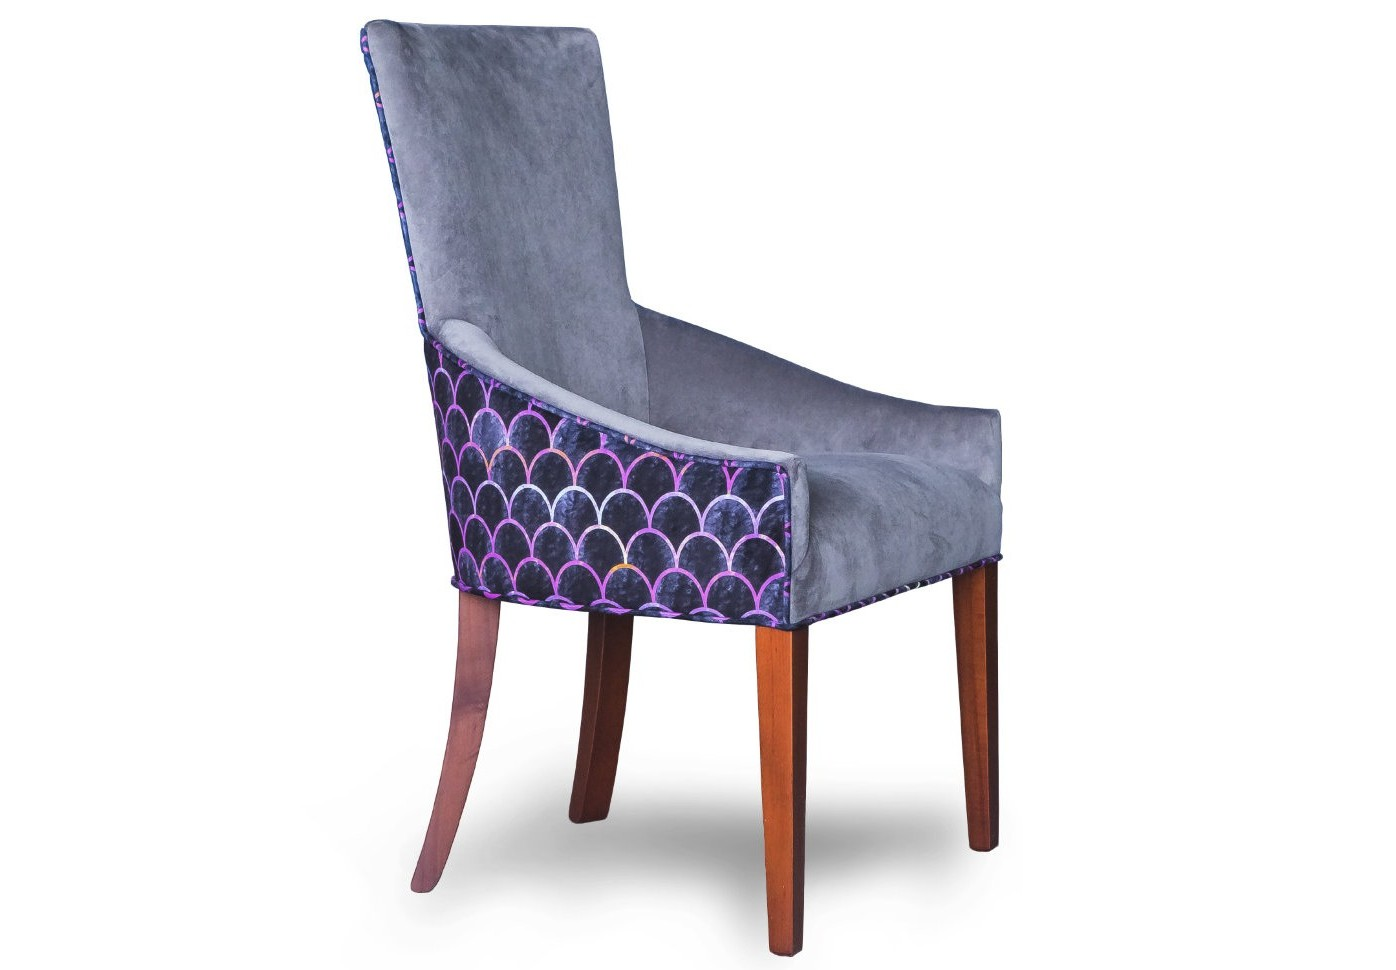 Кухонный стул Icon Designe 15435587 от thefurnish